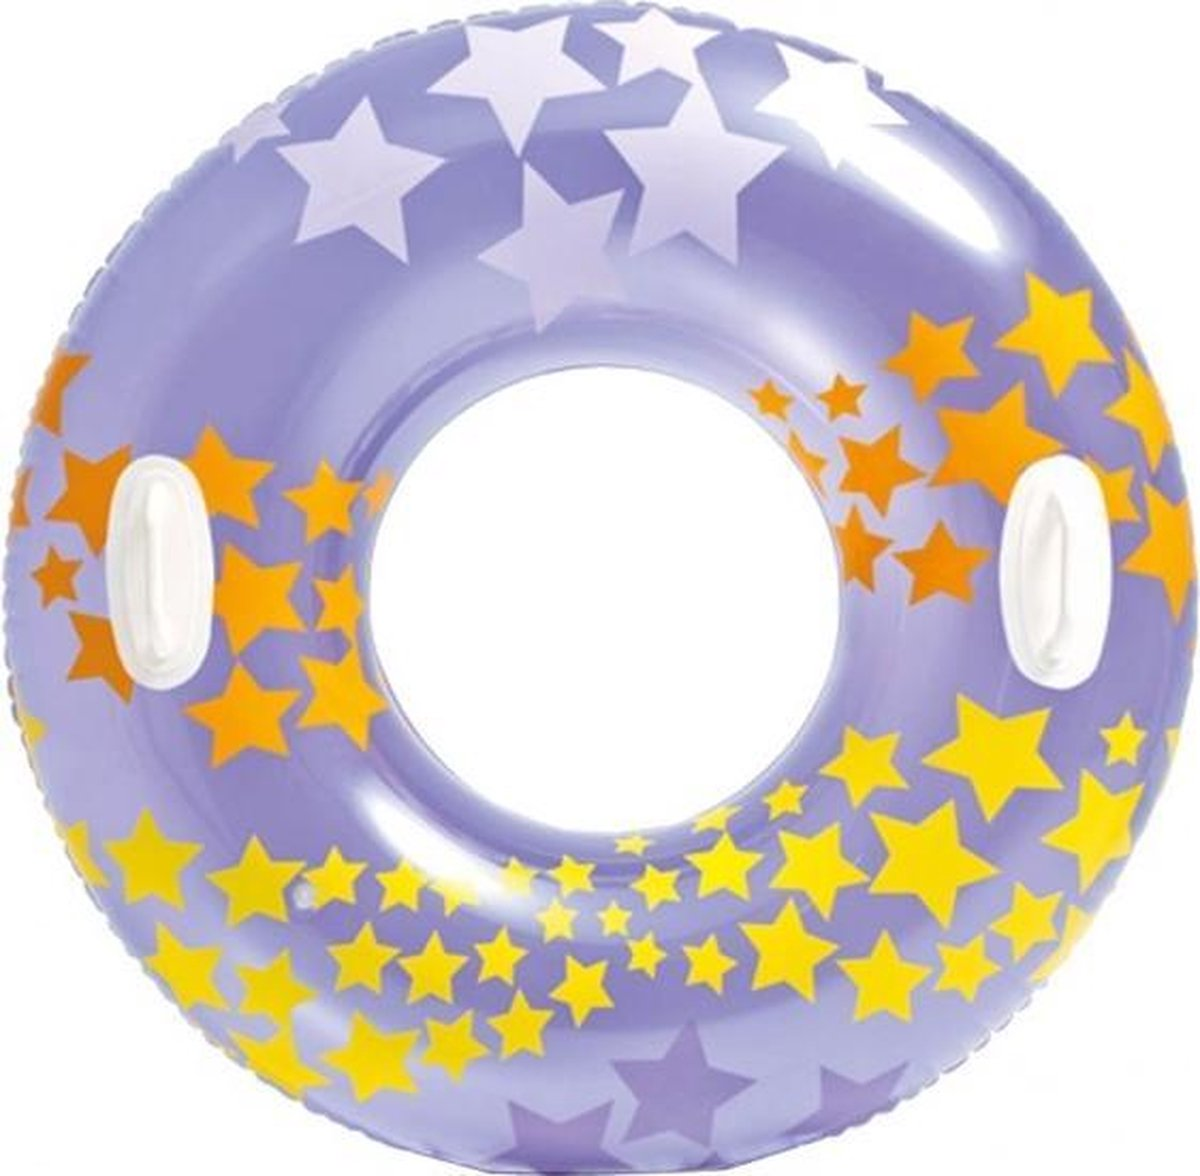 Intex Zwemband Stargaze 91 Cm Paars